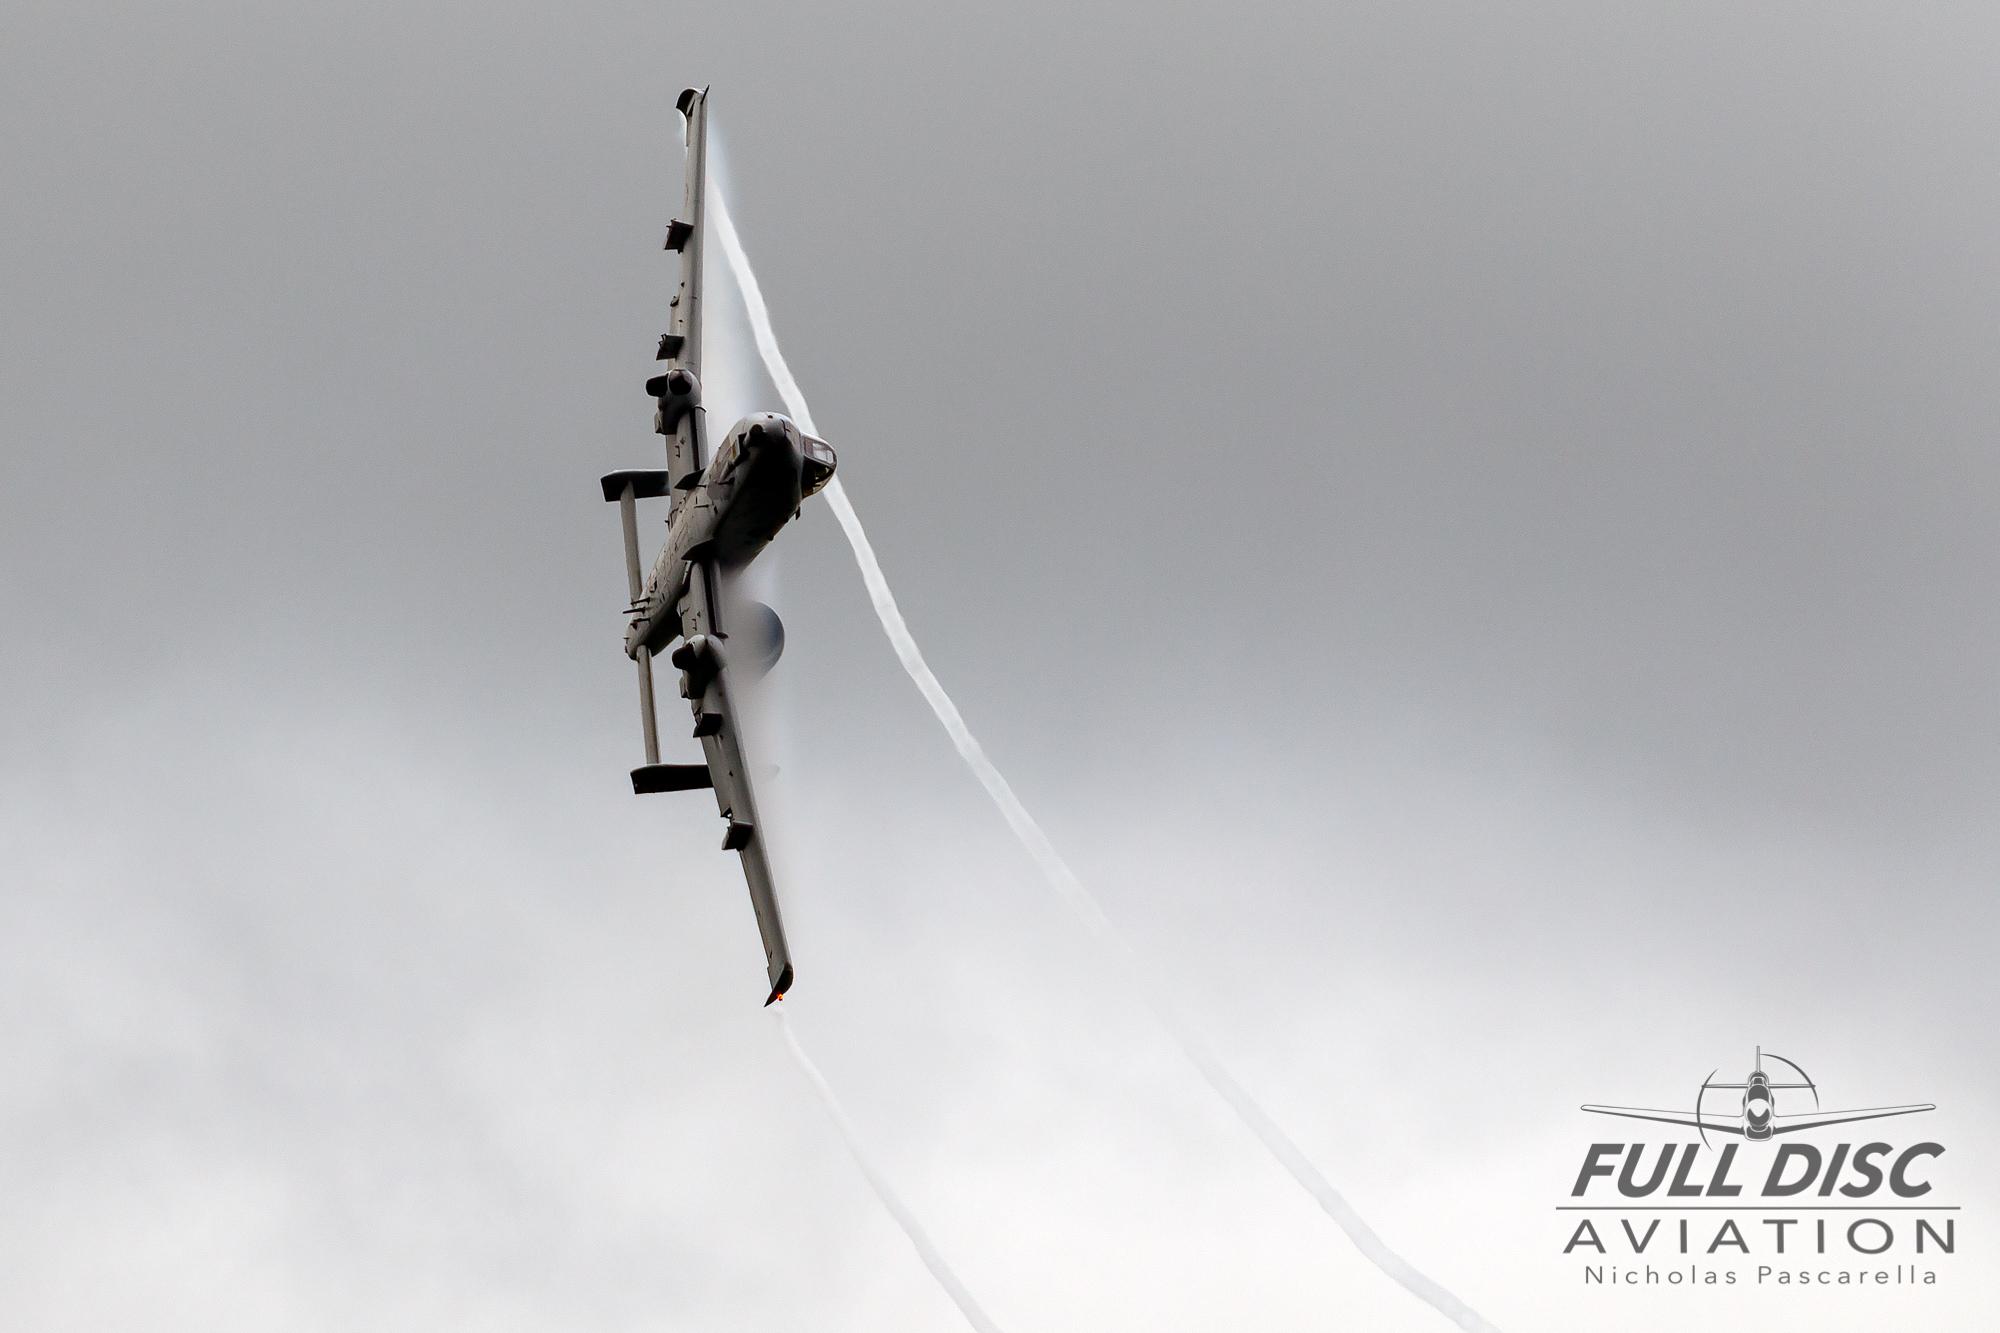 nickpascarella_nicholaspascarella_fulldiscaviation_aircraft_a10warthog_vapor.jpg